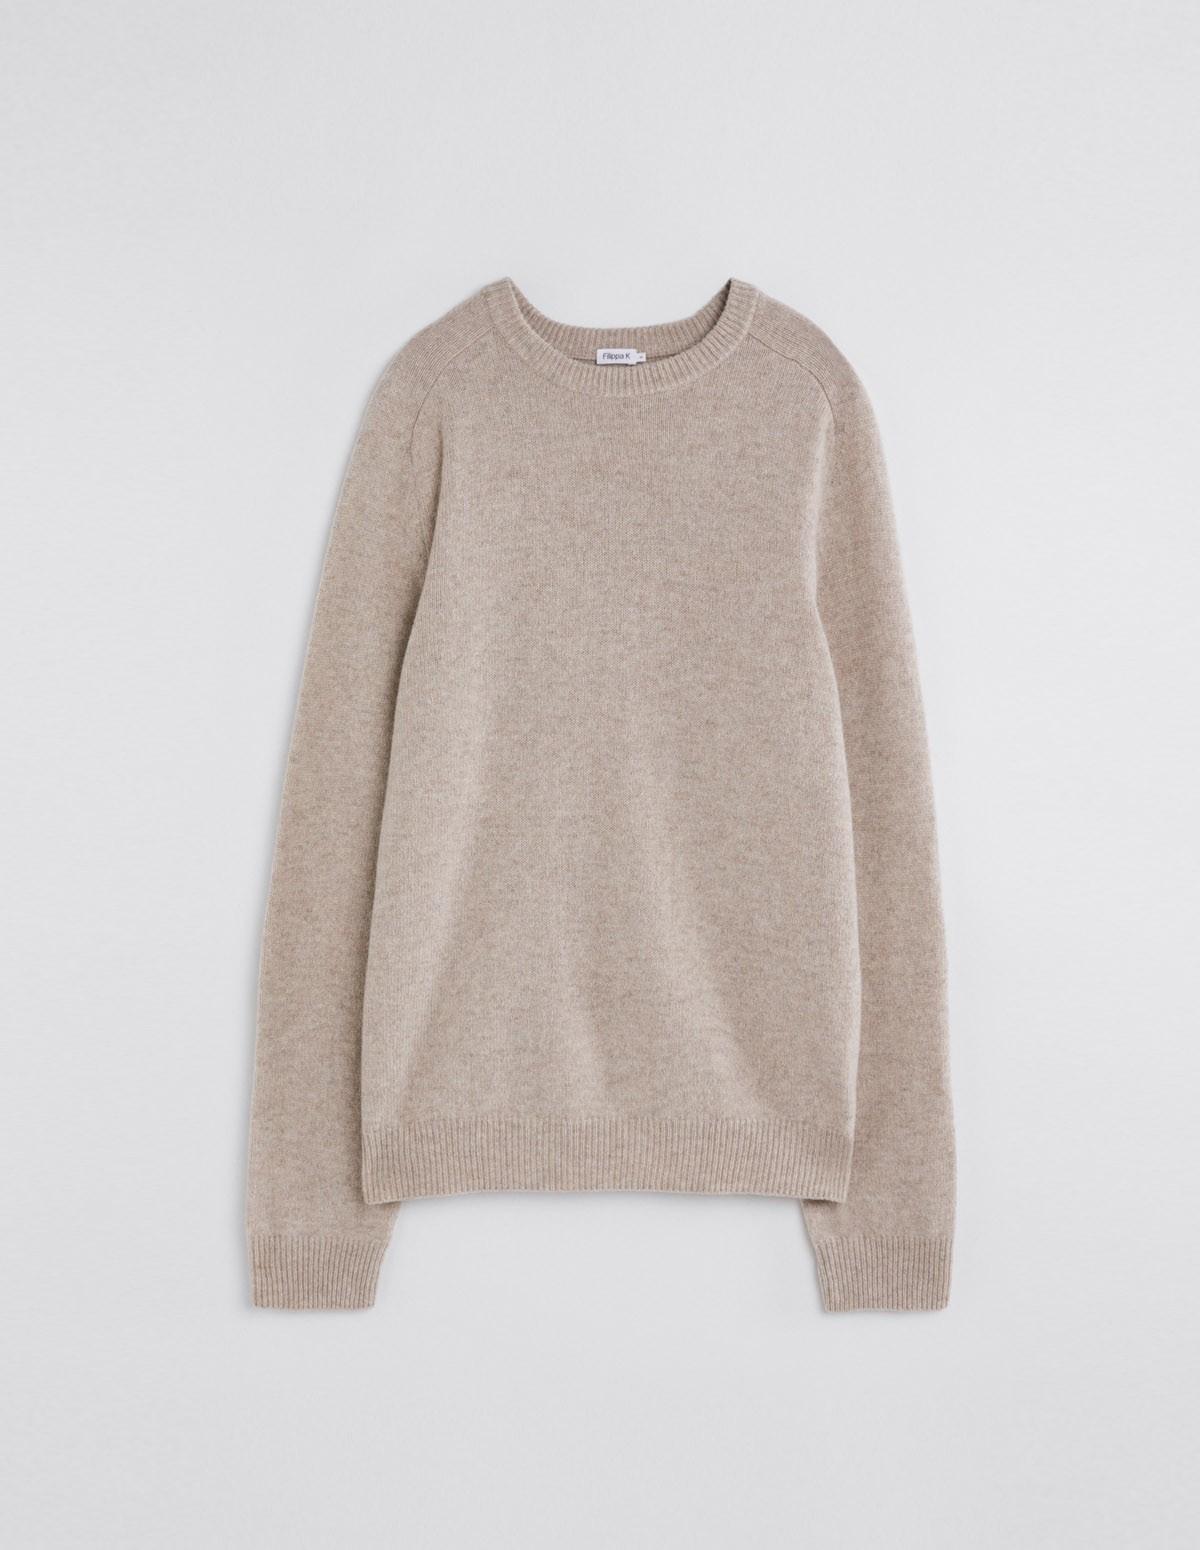 Fk Dino Sweater